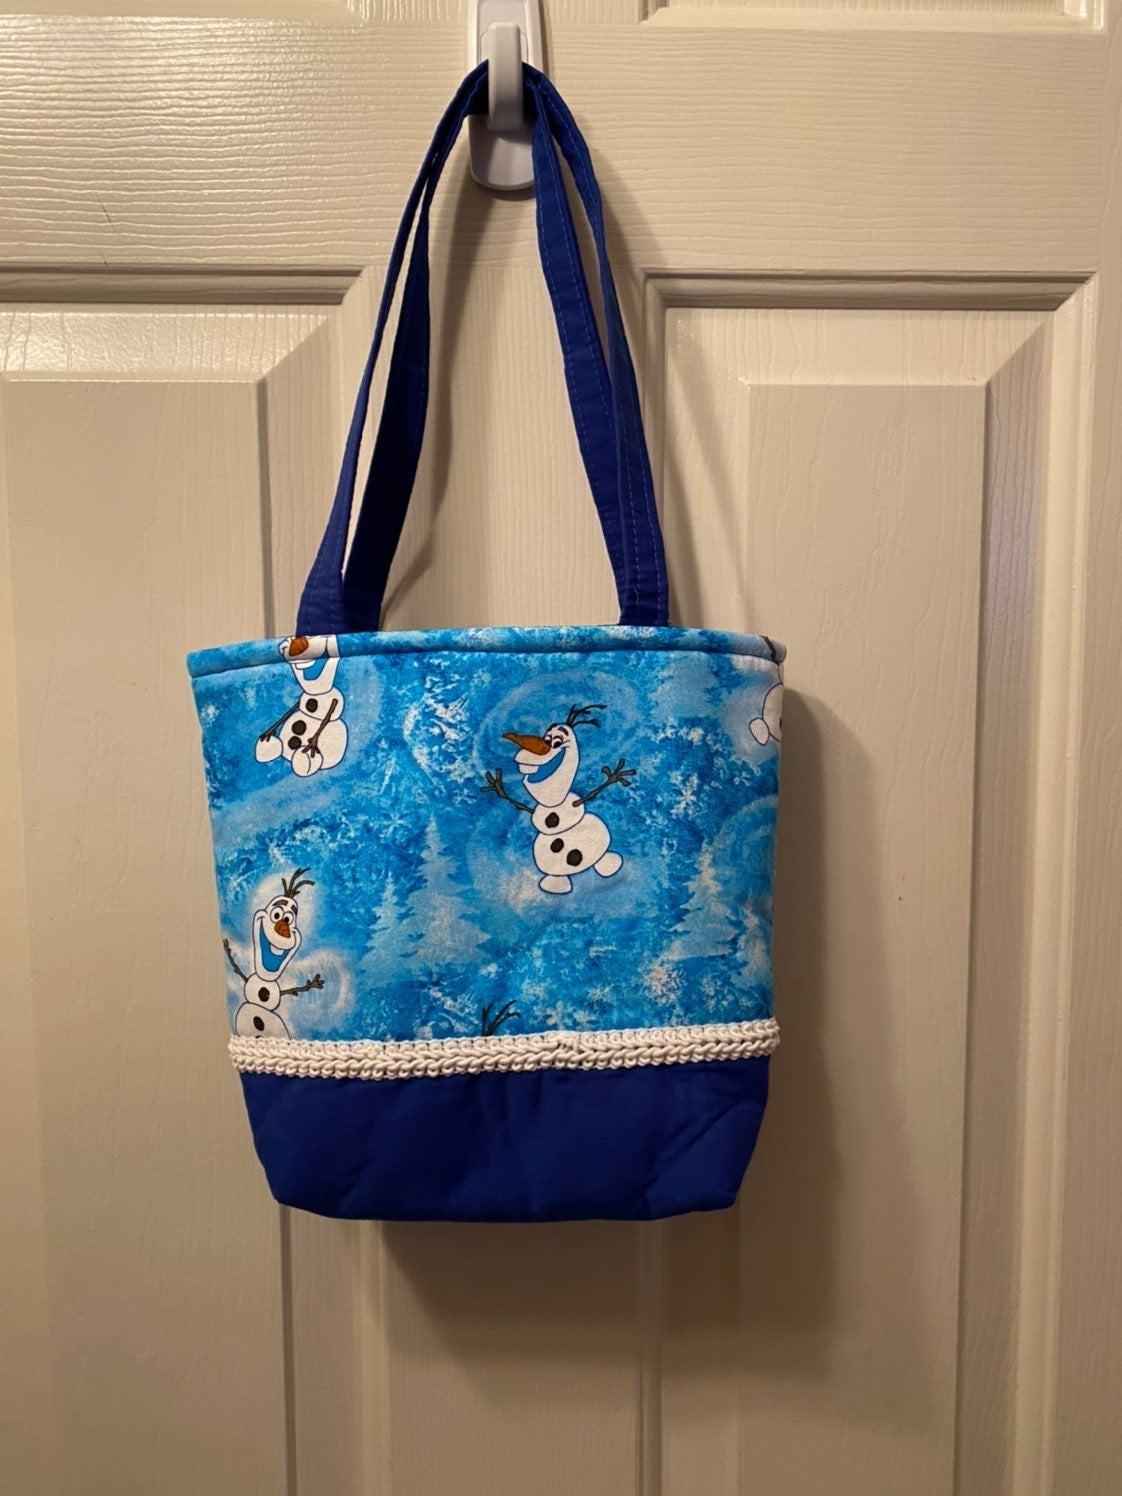 Frozen Olaf tote bag purse girls